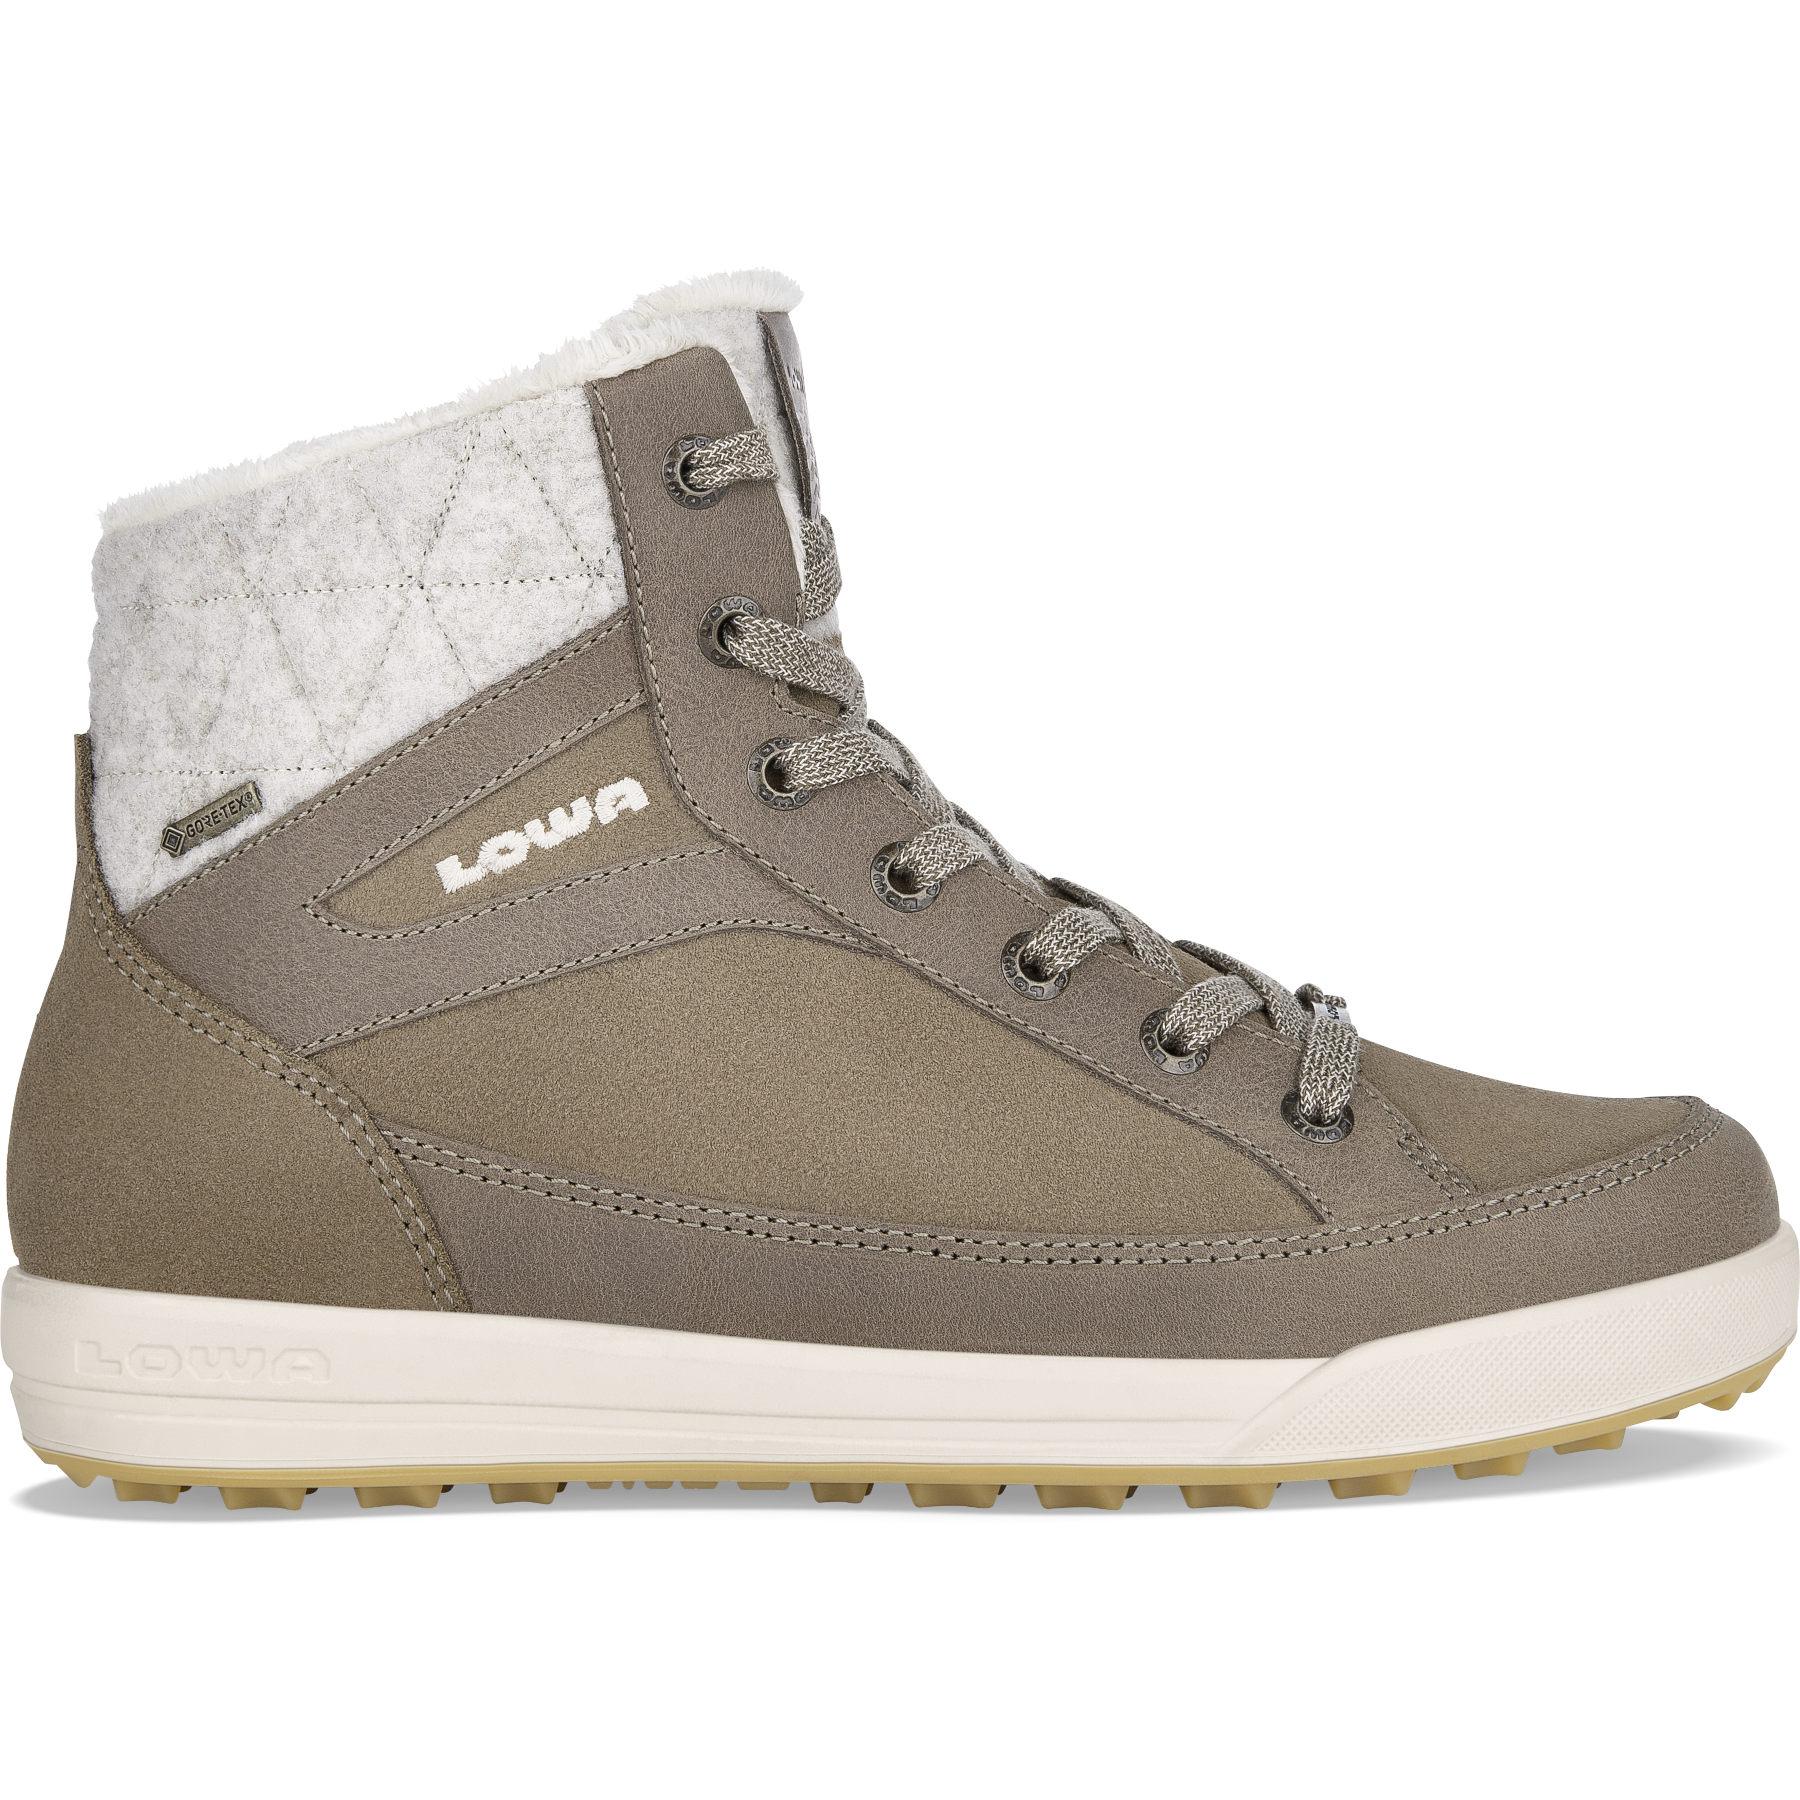 Image of LOWA Casara GTX Ws Womens Winter Shoe - stone